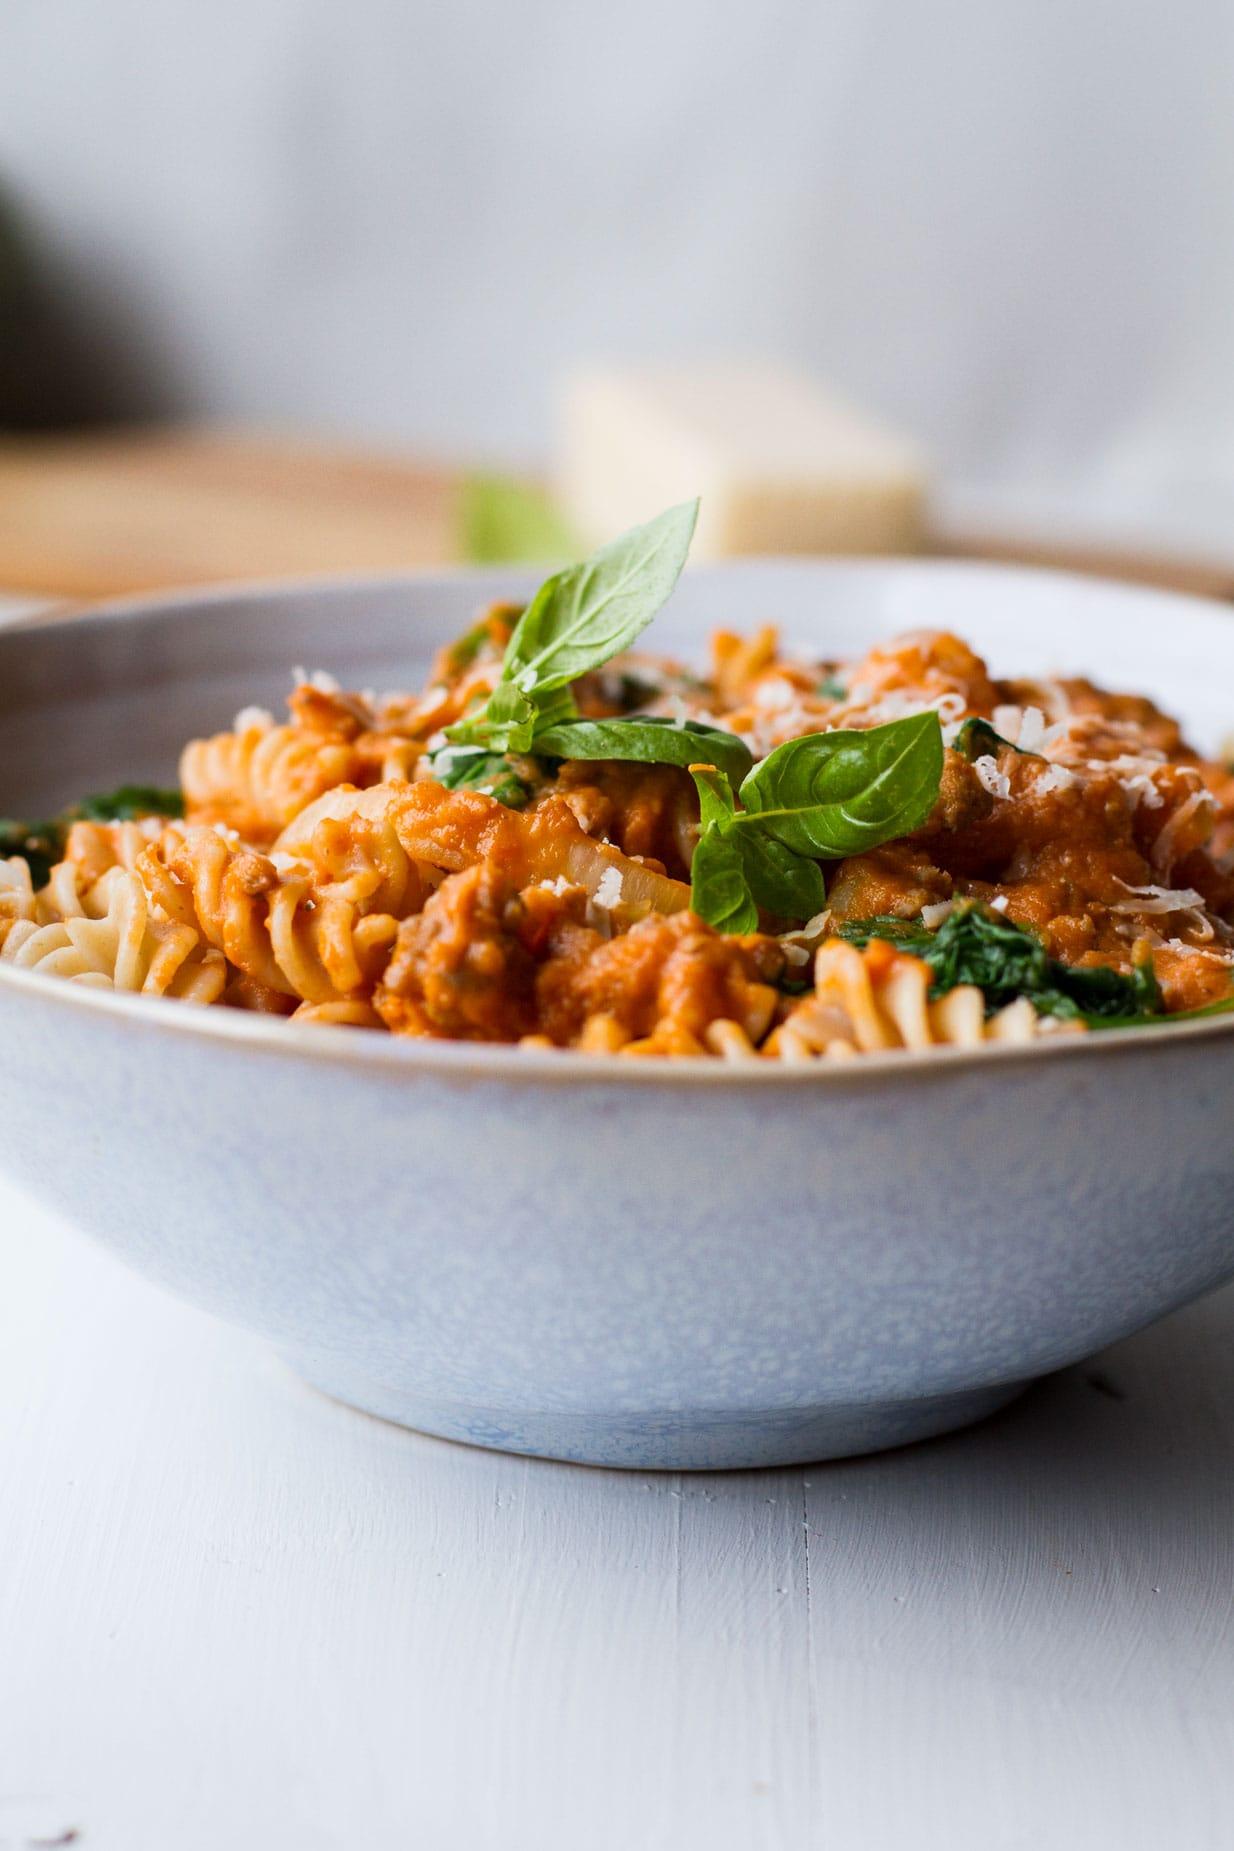 Creamy Parmesan Pumpkin Pasta in a blue bowl, garnished with fresh basil.